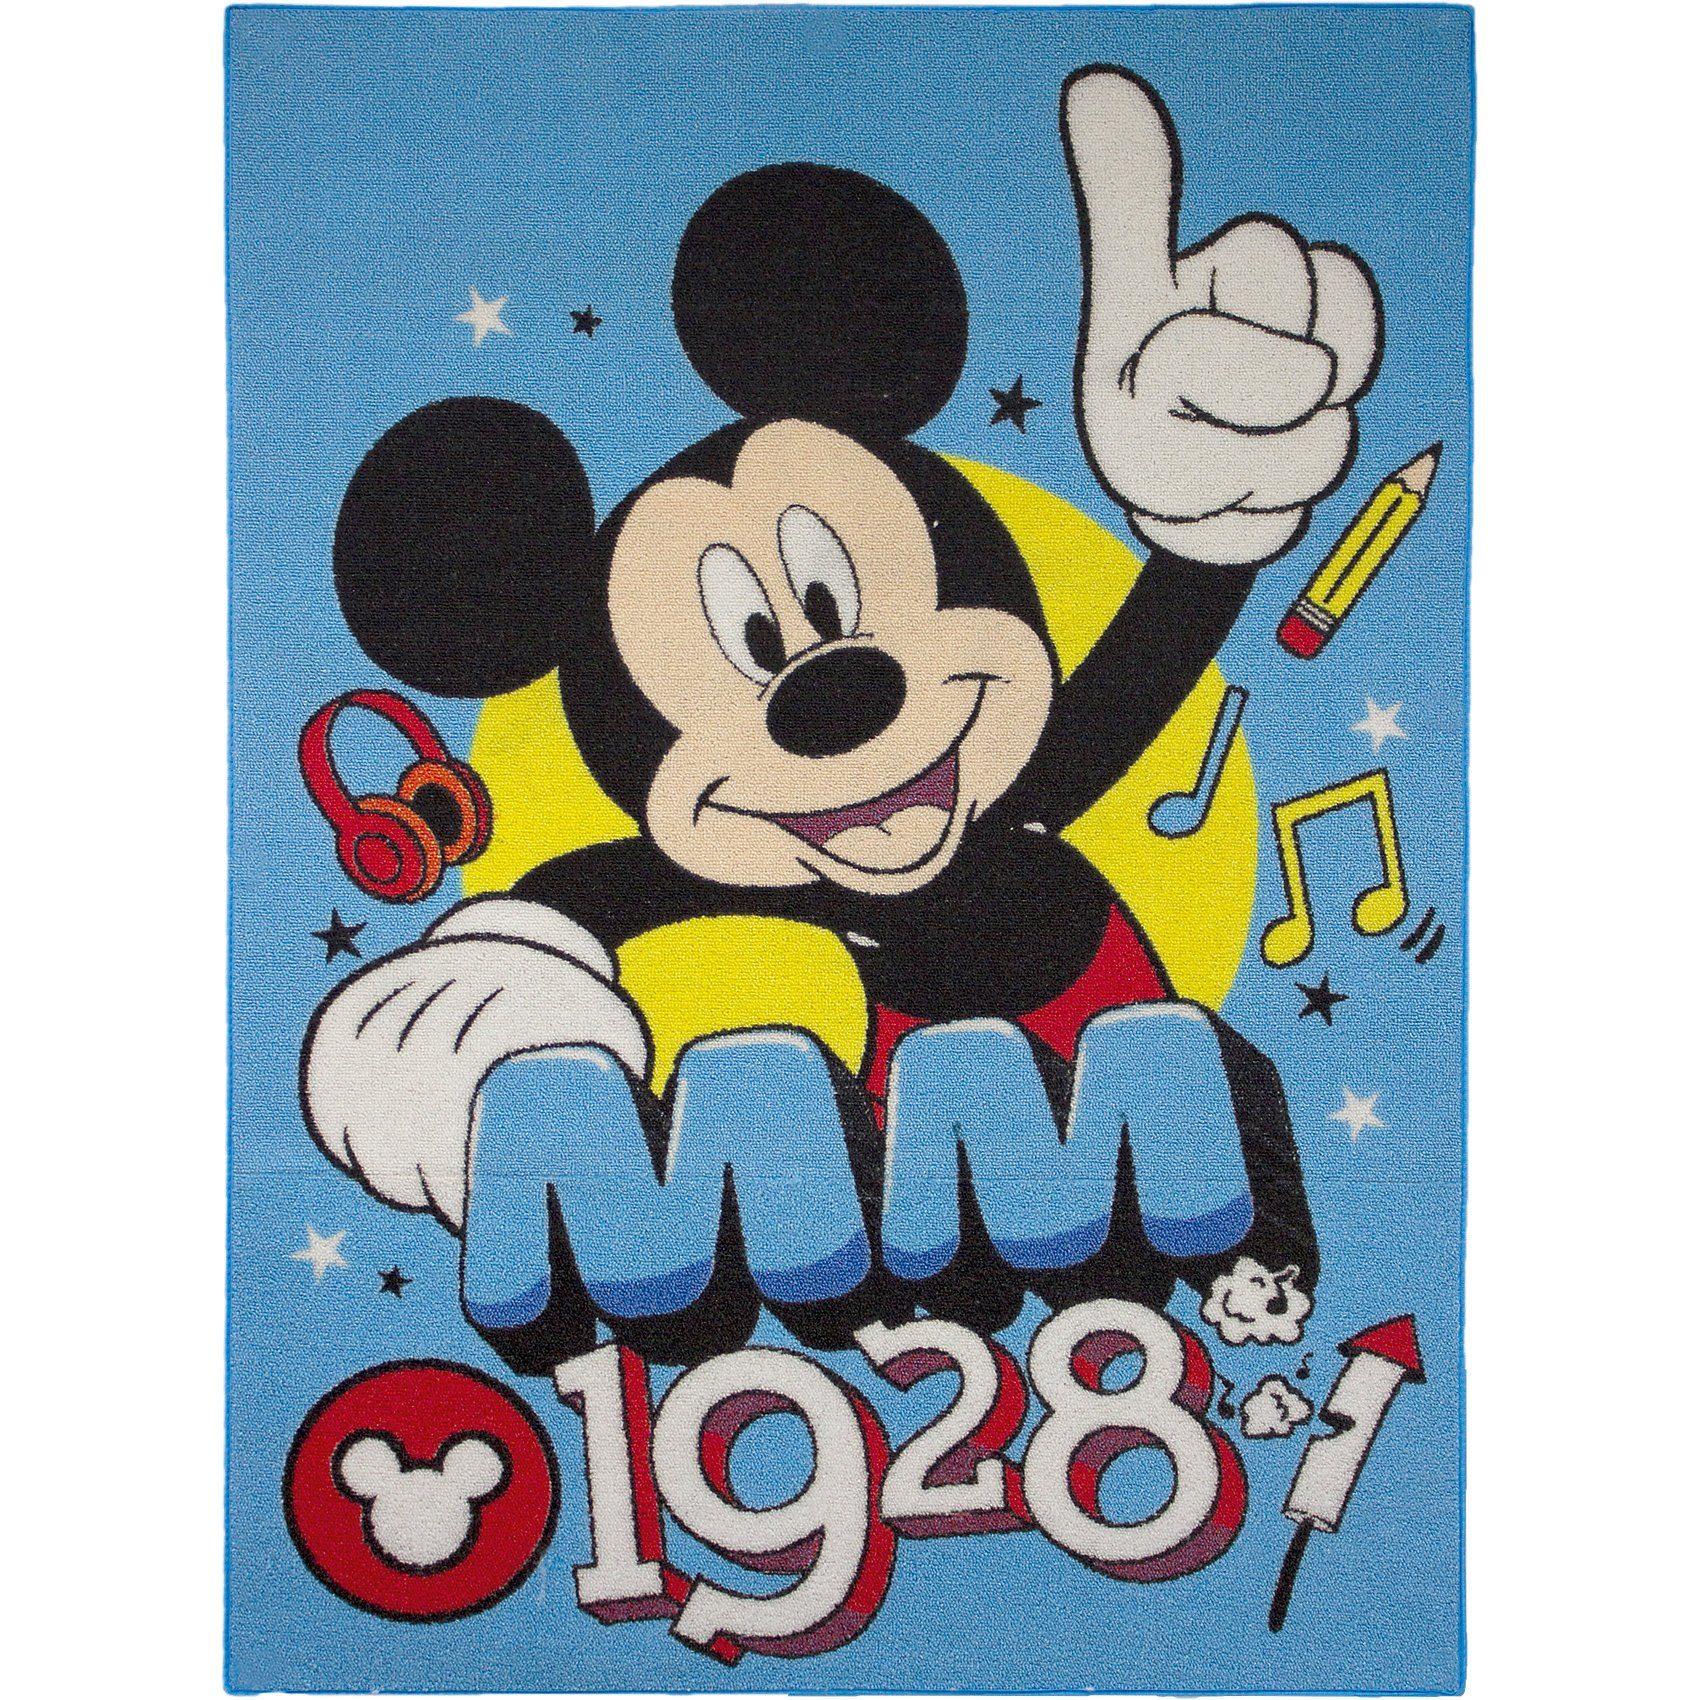 Kinderteppich Mickey MM 1928, 95 x 133 cm